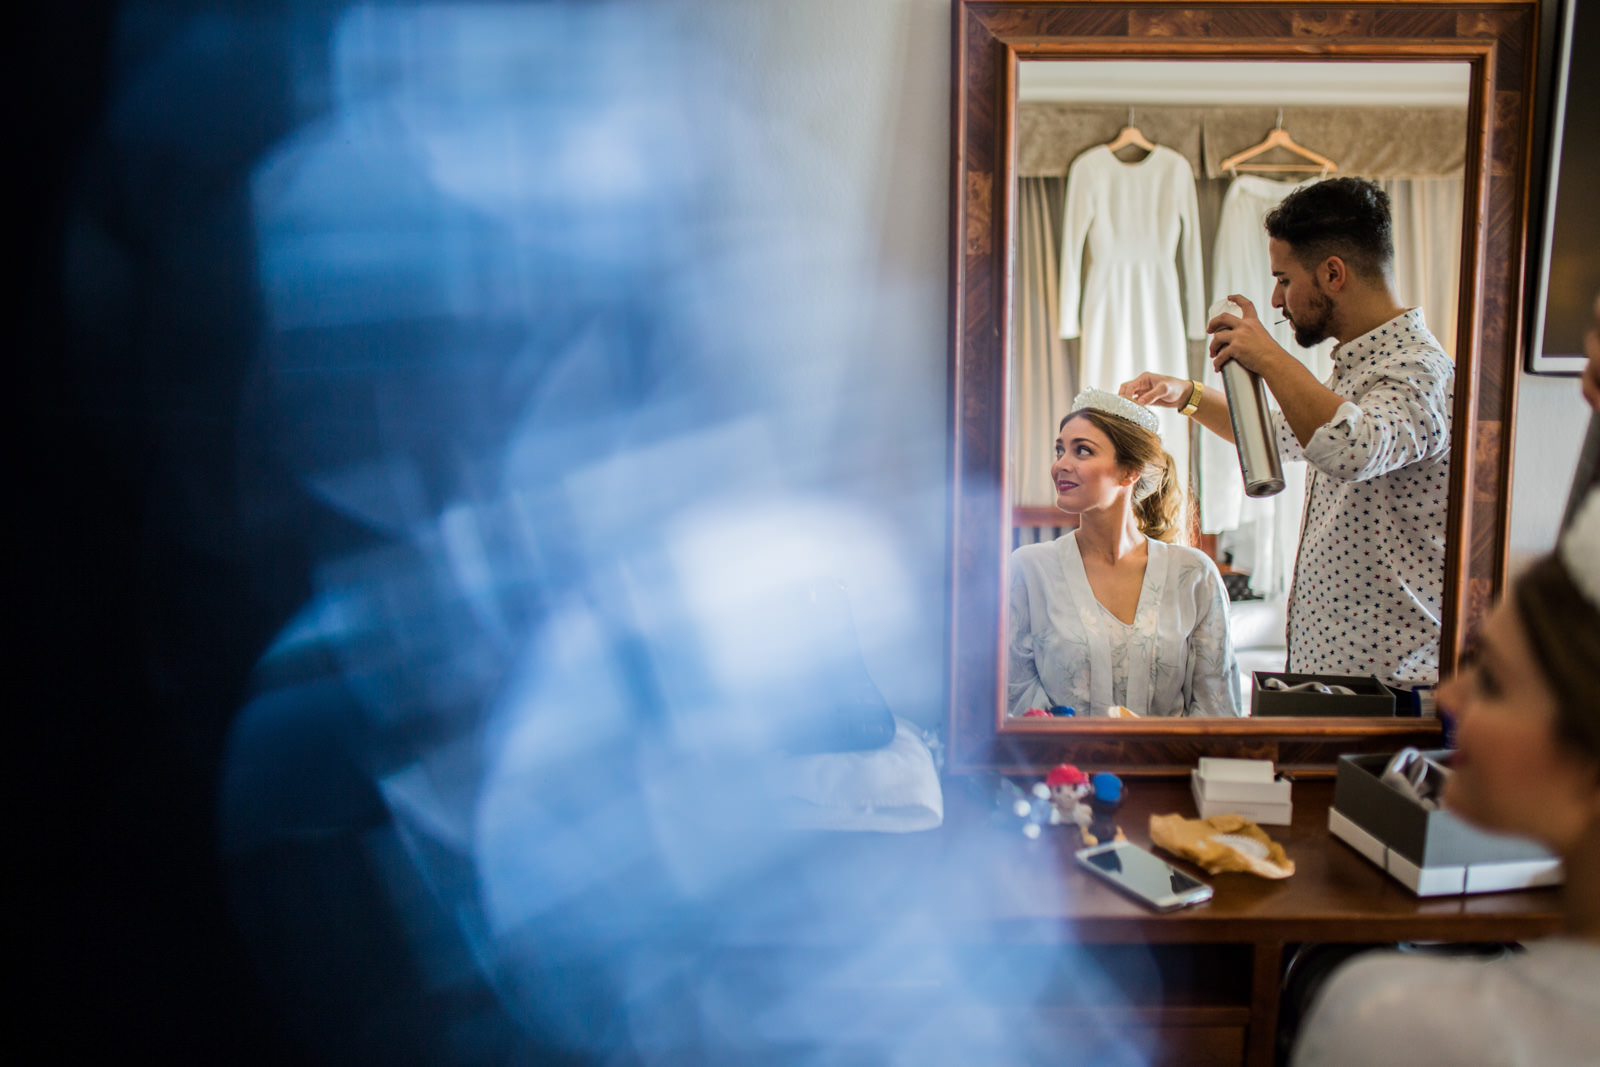 Boda-Sevilla-Parador-Carmona-bridal-engagement-Rafael-Torres-fotografo-bodas-sevilla-madrid-barcelona-wedding-photographer--22.jpg